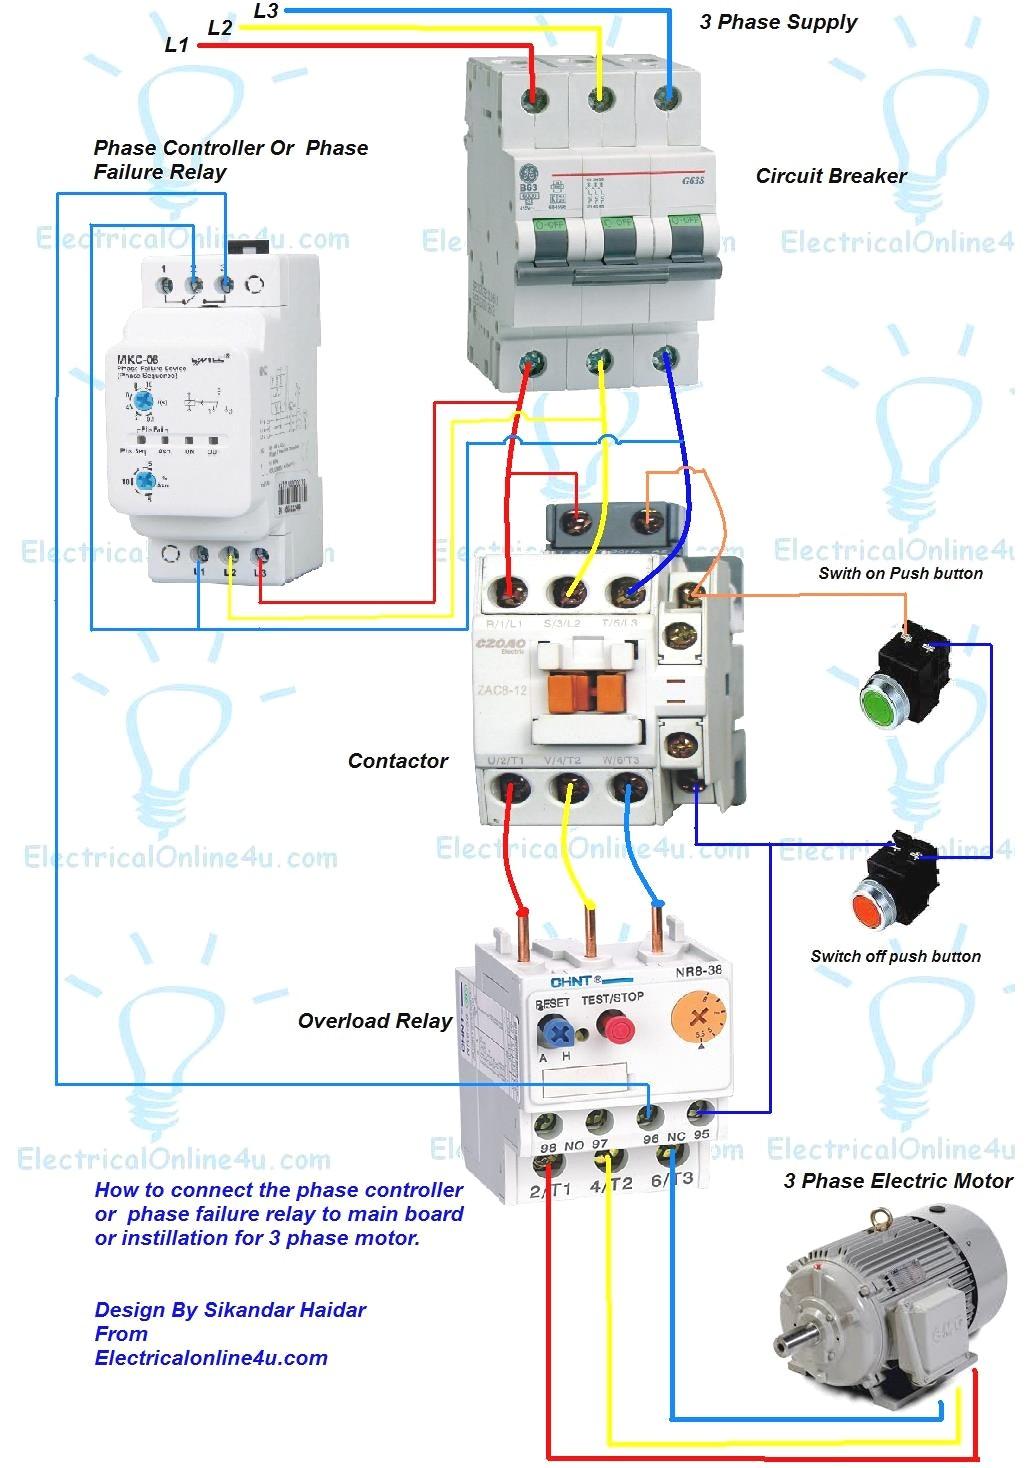 ry_4840] eaton contactor wiring diagram free diagram  eumqu embo vish ungo sapebe mohammedshrine librar wiring 101